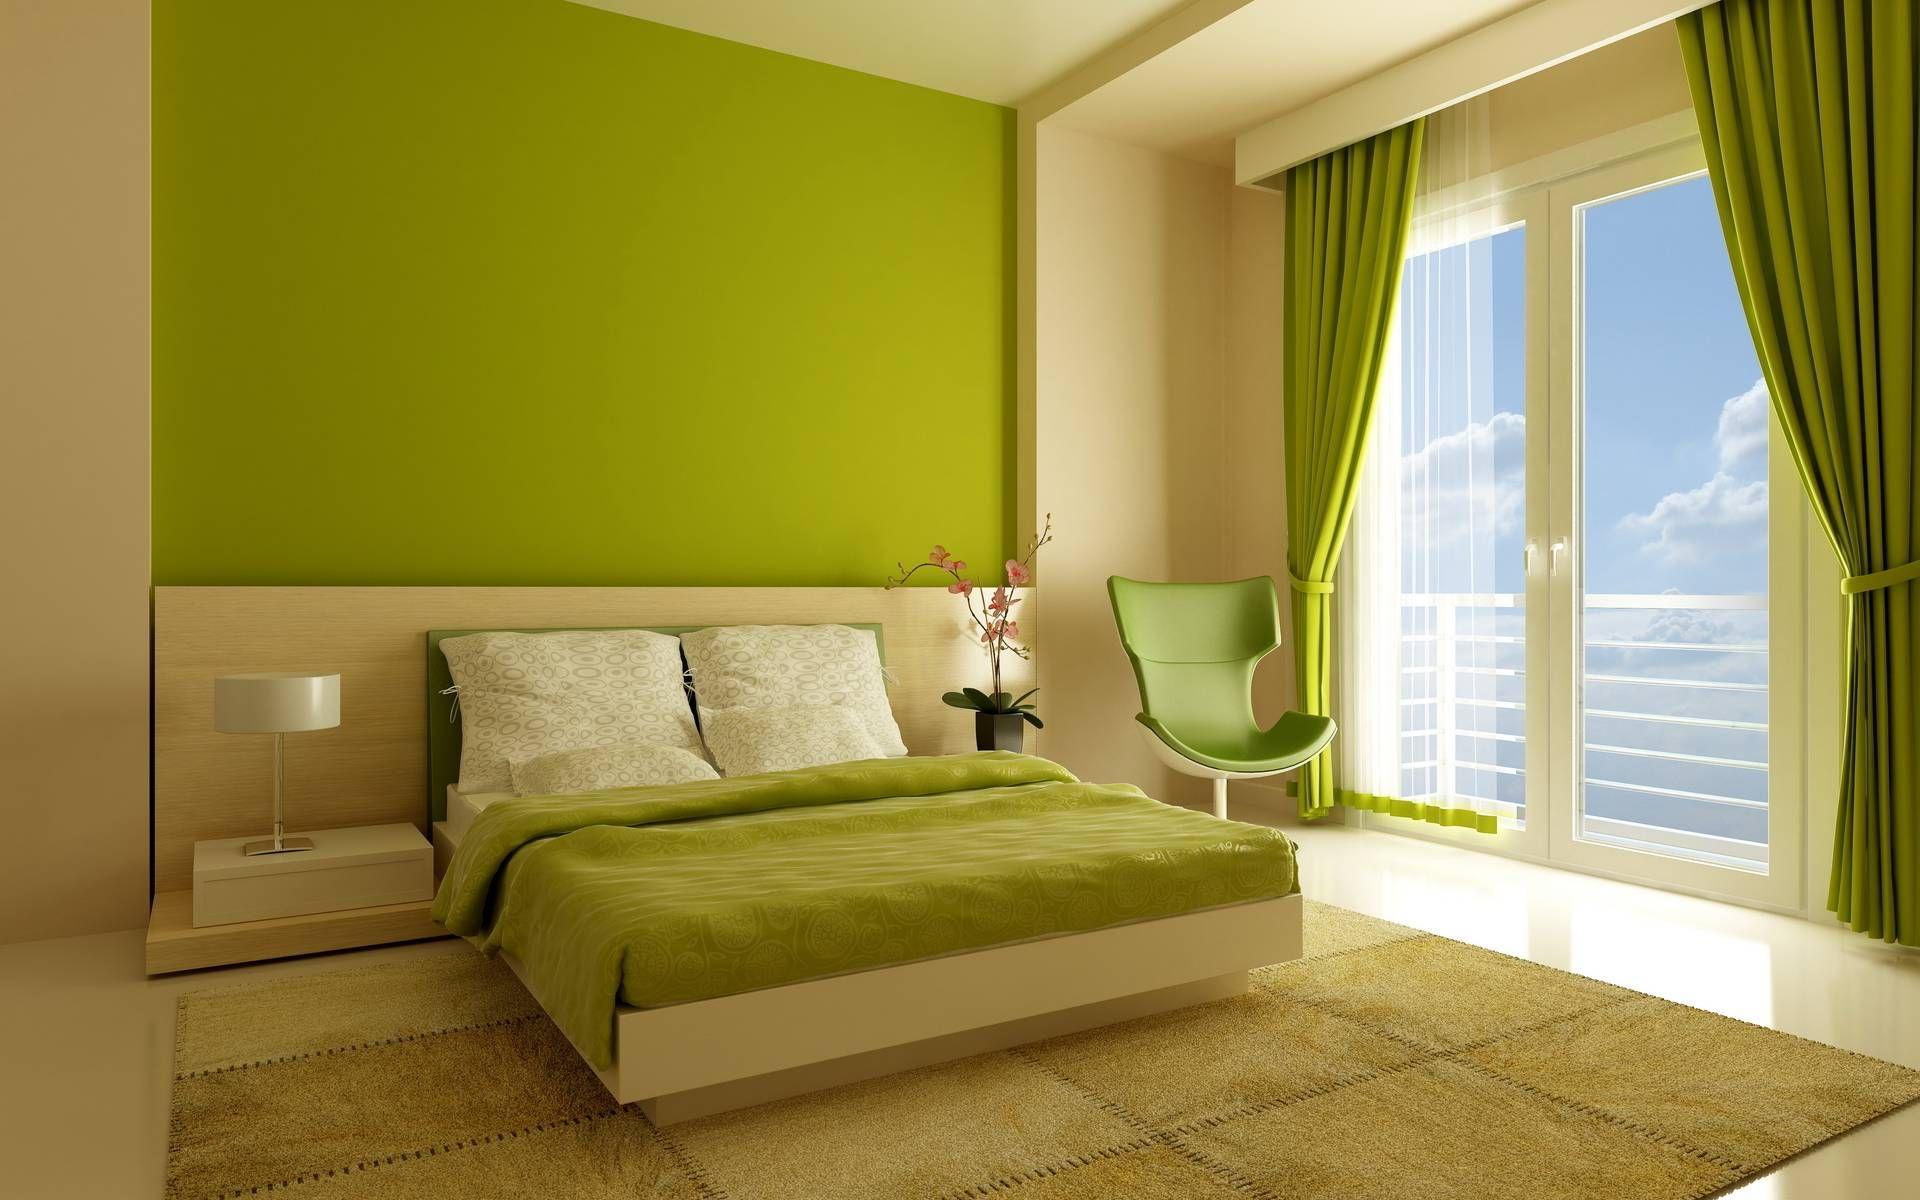 Green Sofa Green Furniture Green Decor Living Room Decor Room Makeover Modern Decor Contem Bedroom Color Combination Green Bedroom Colors Bedroom Colors New bedroom green color